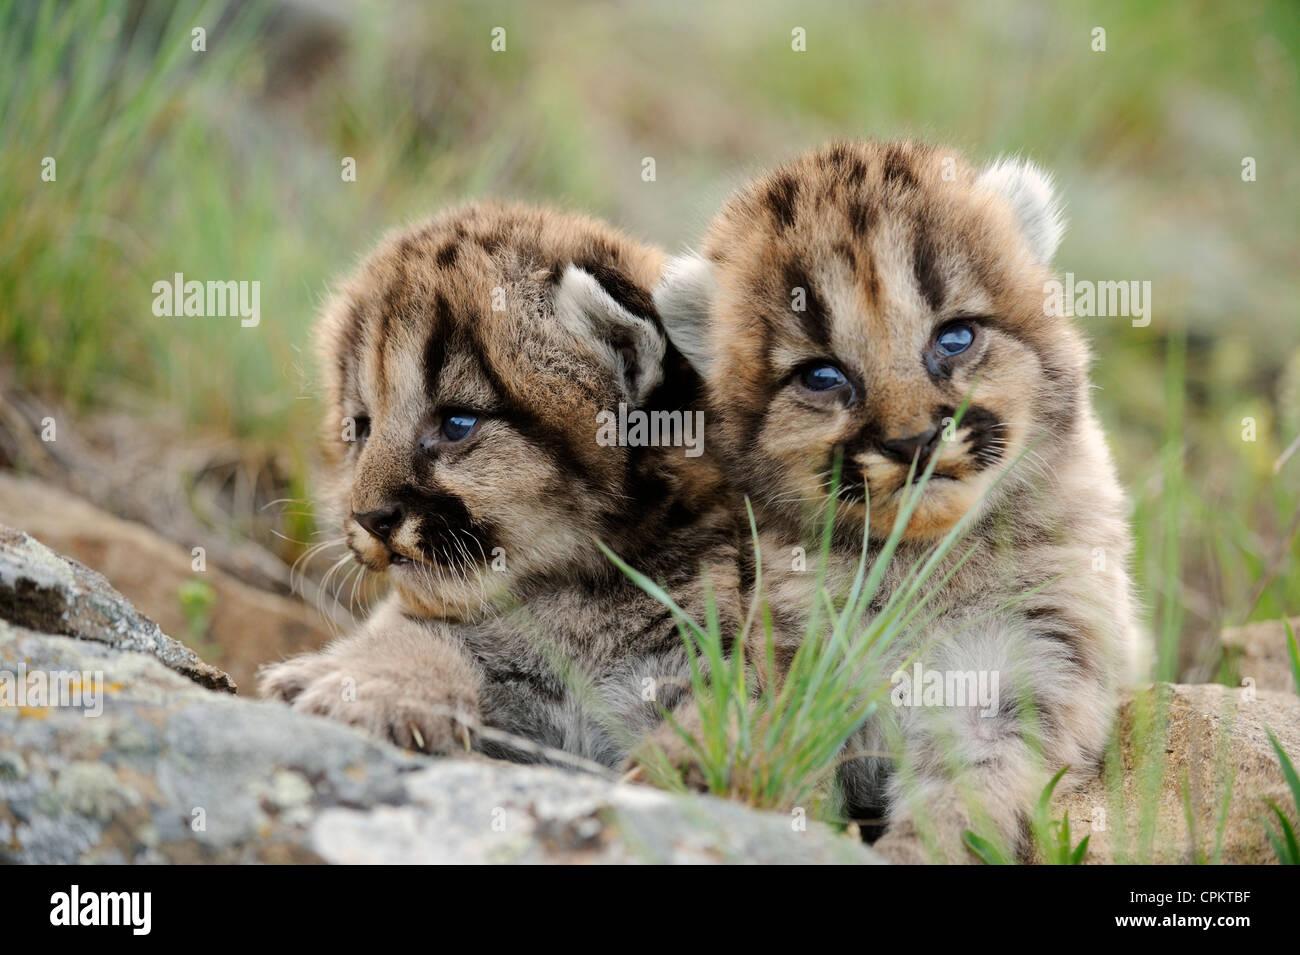 kitten wallpapers free download